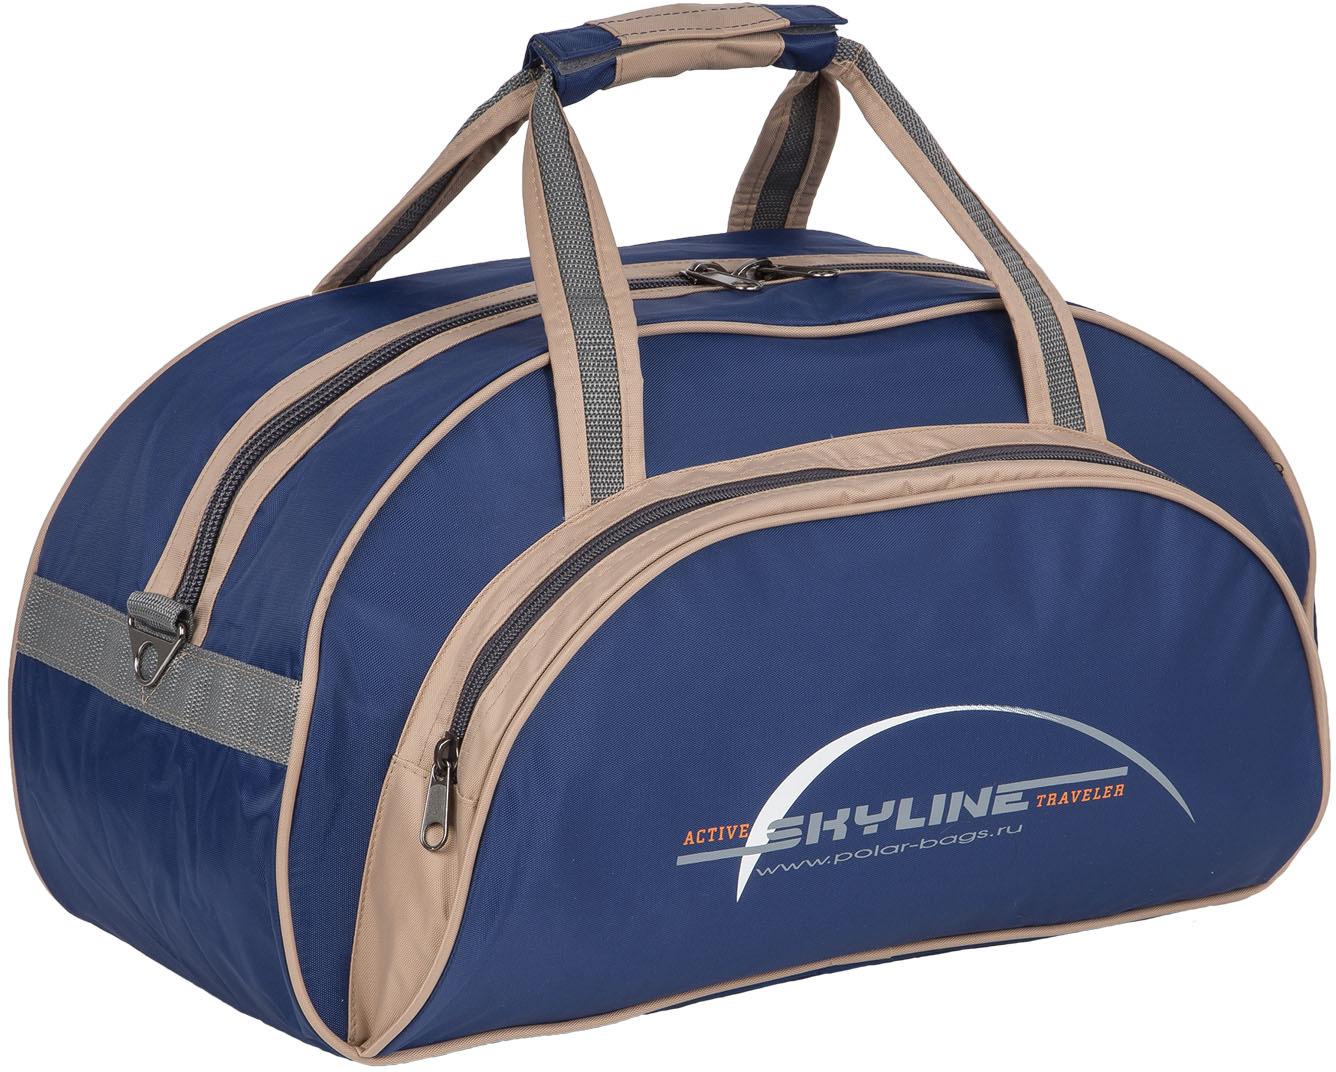 сумки переноски Сумка спортивная Polar Скайлайн, цвет: синий, бежевый, серый, 25 л